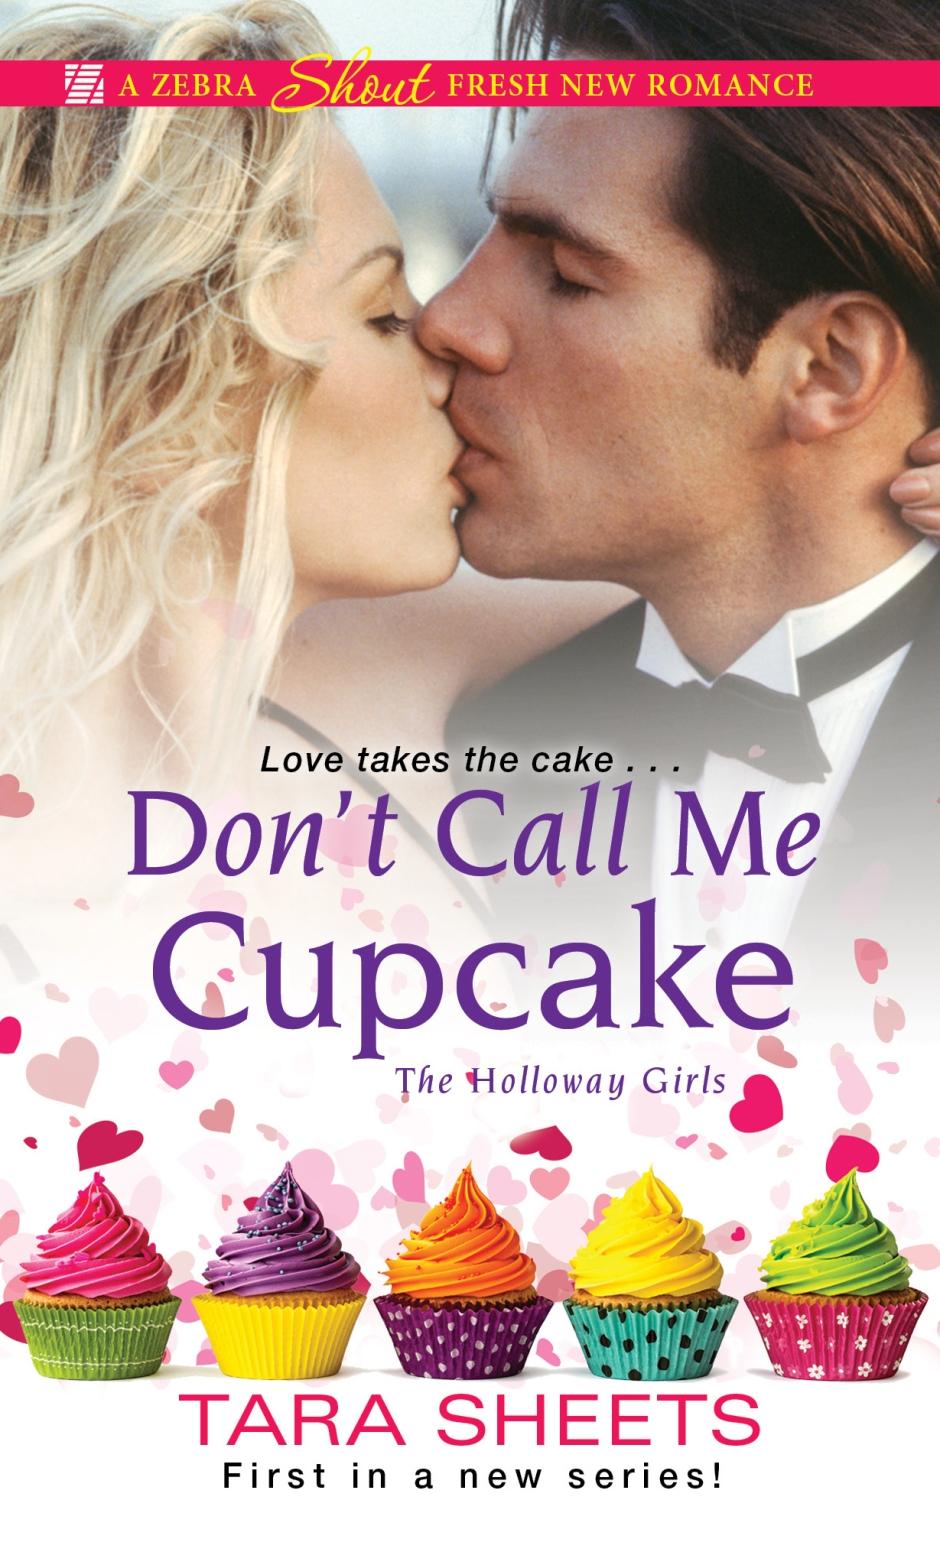 CUPCAKE book cover